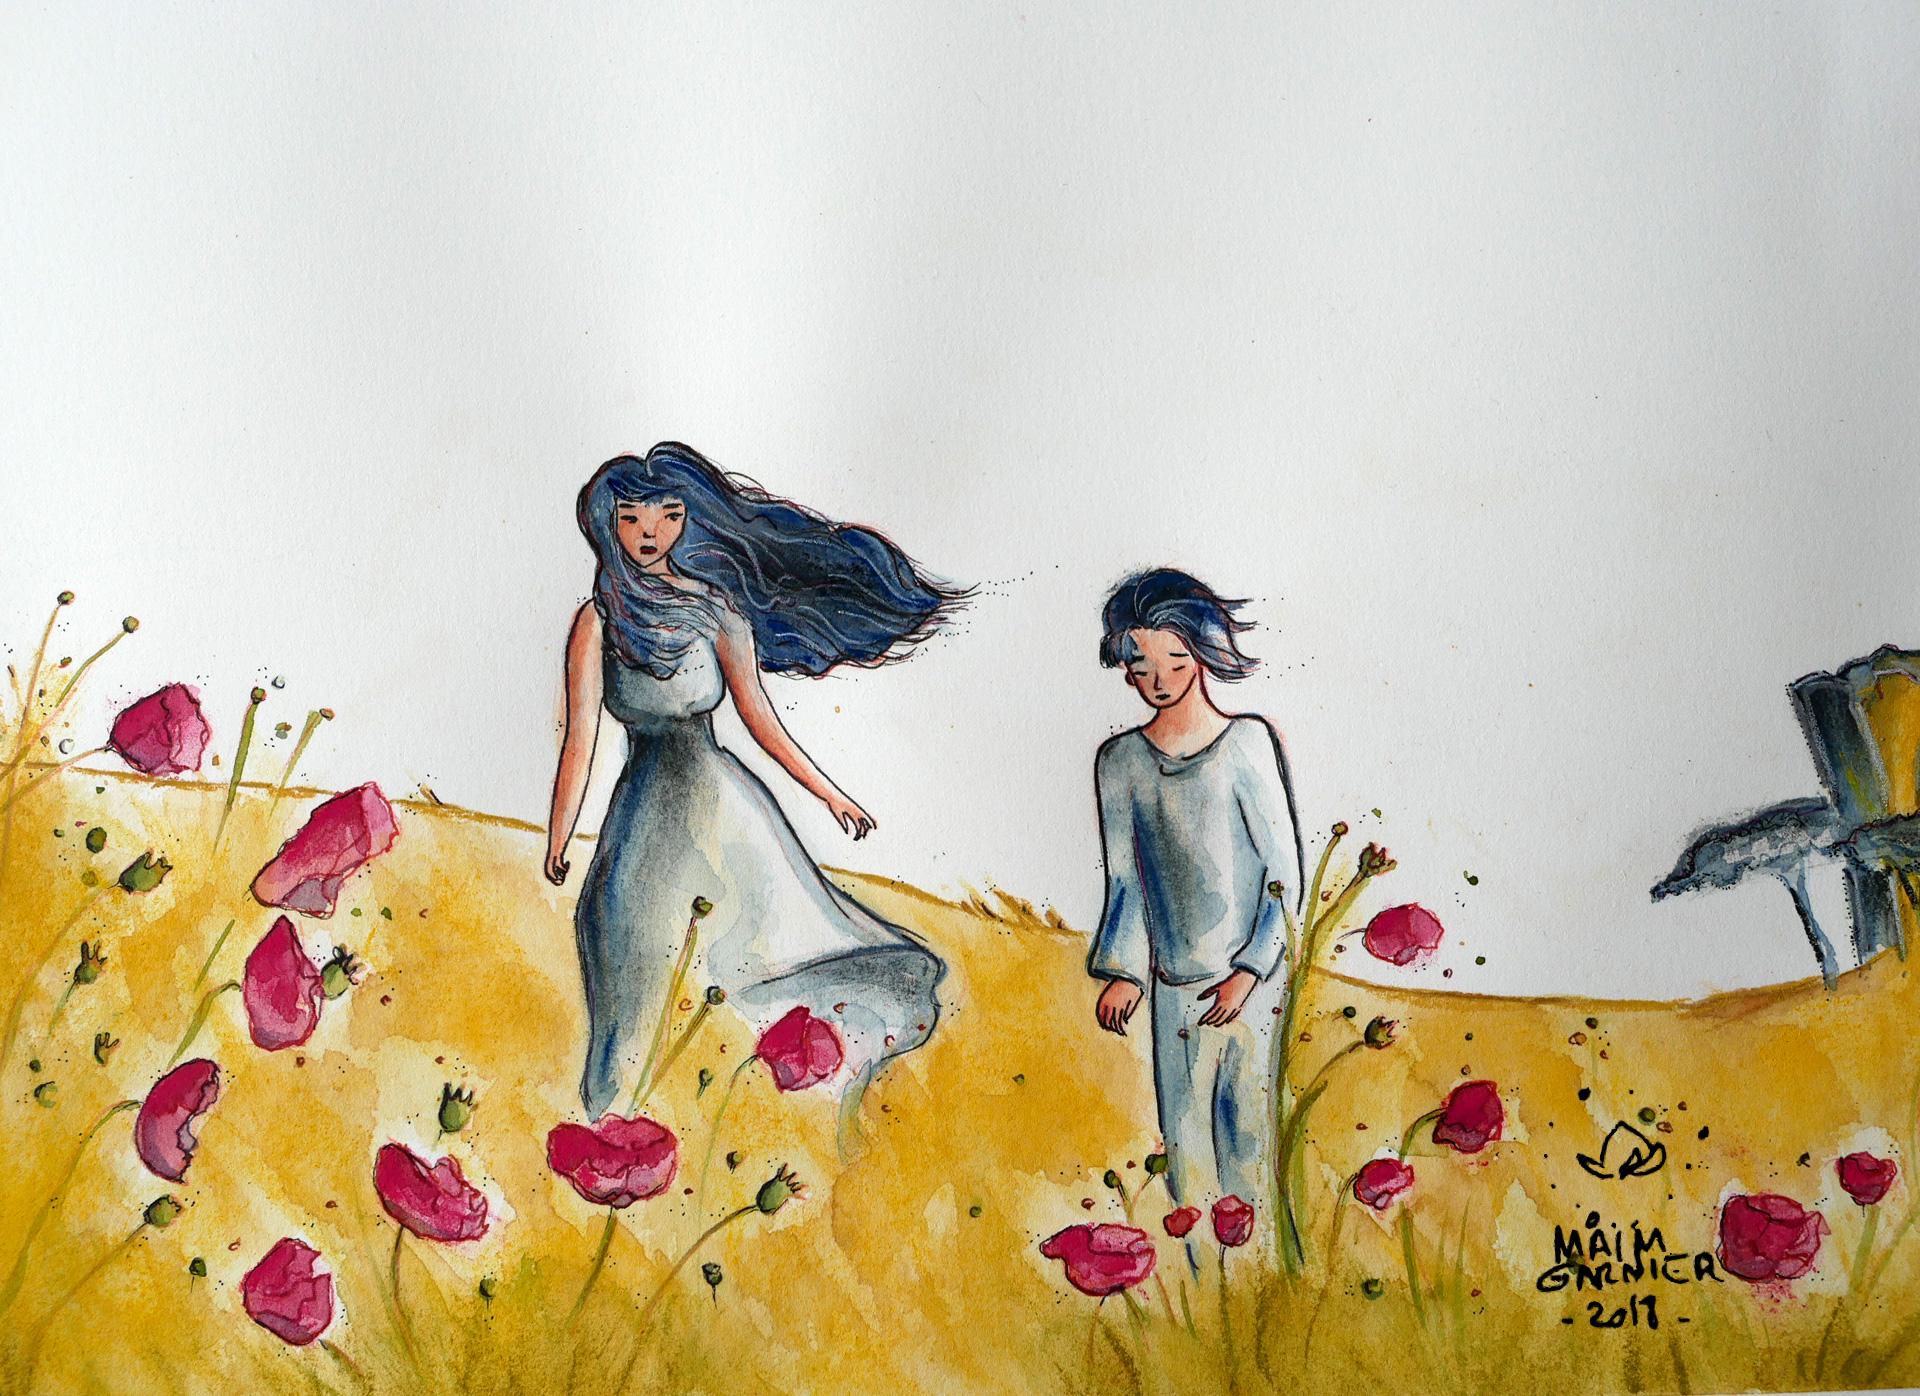 Illustration aquarelle \u00e0 d\u00e9couvrir sur Sansible ~ Ma\u00efm Garnier